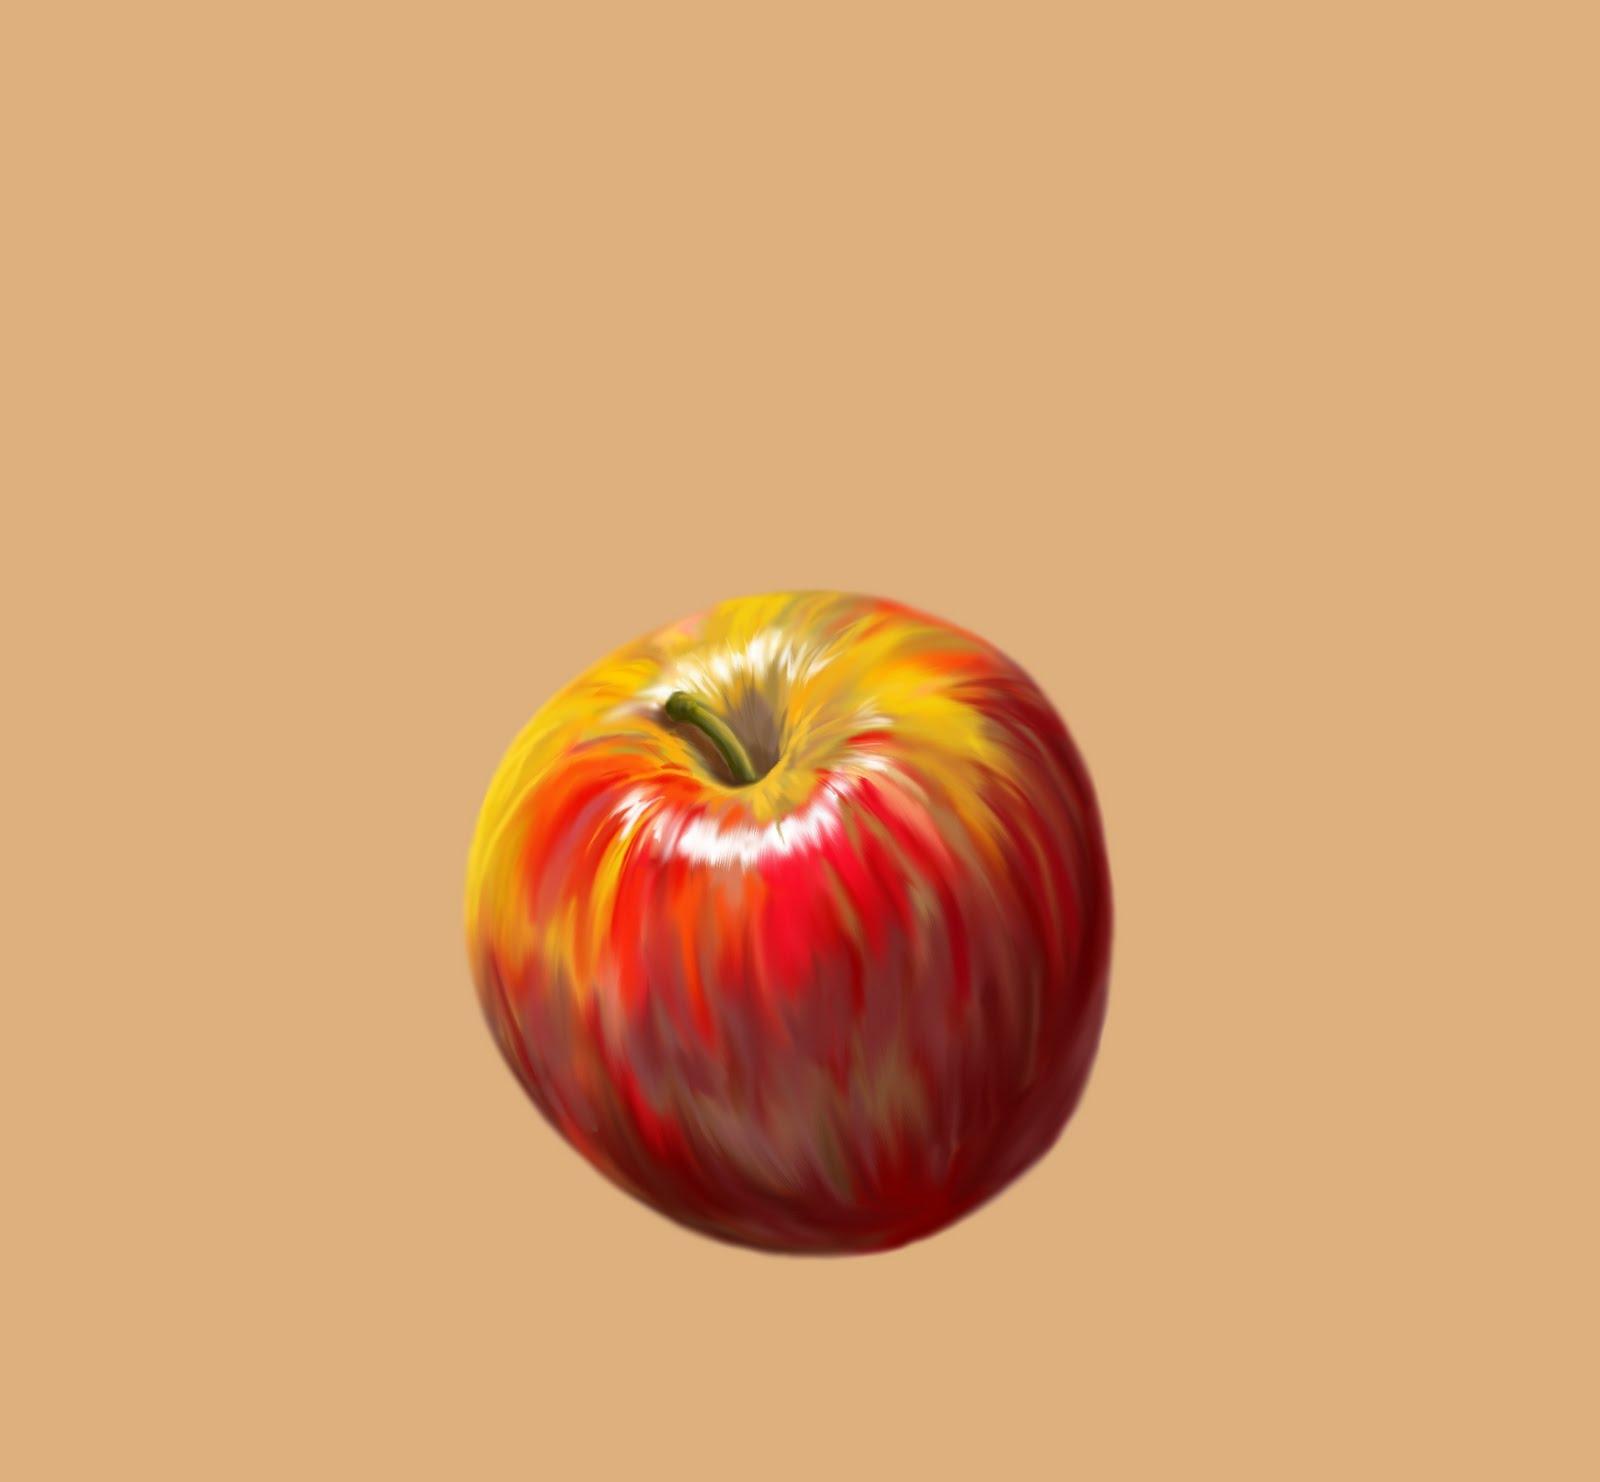 [apple_1]